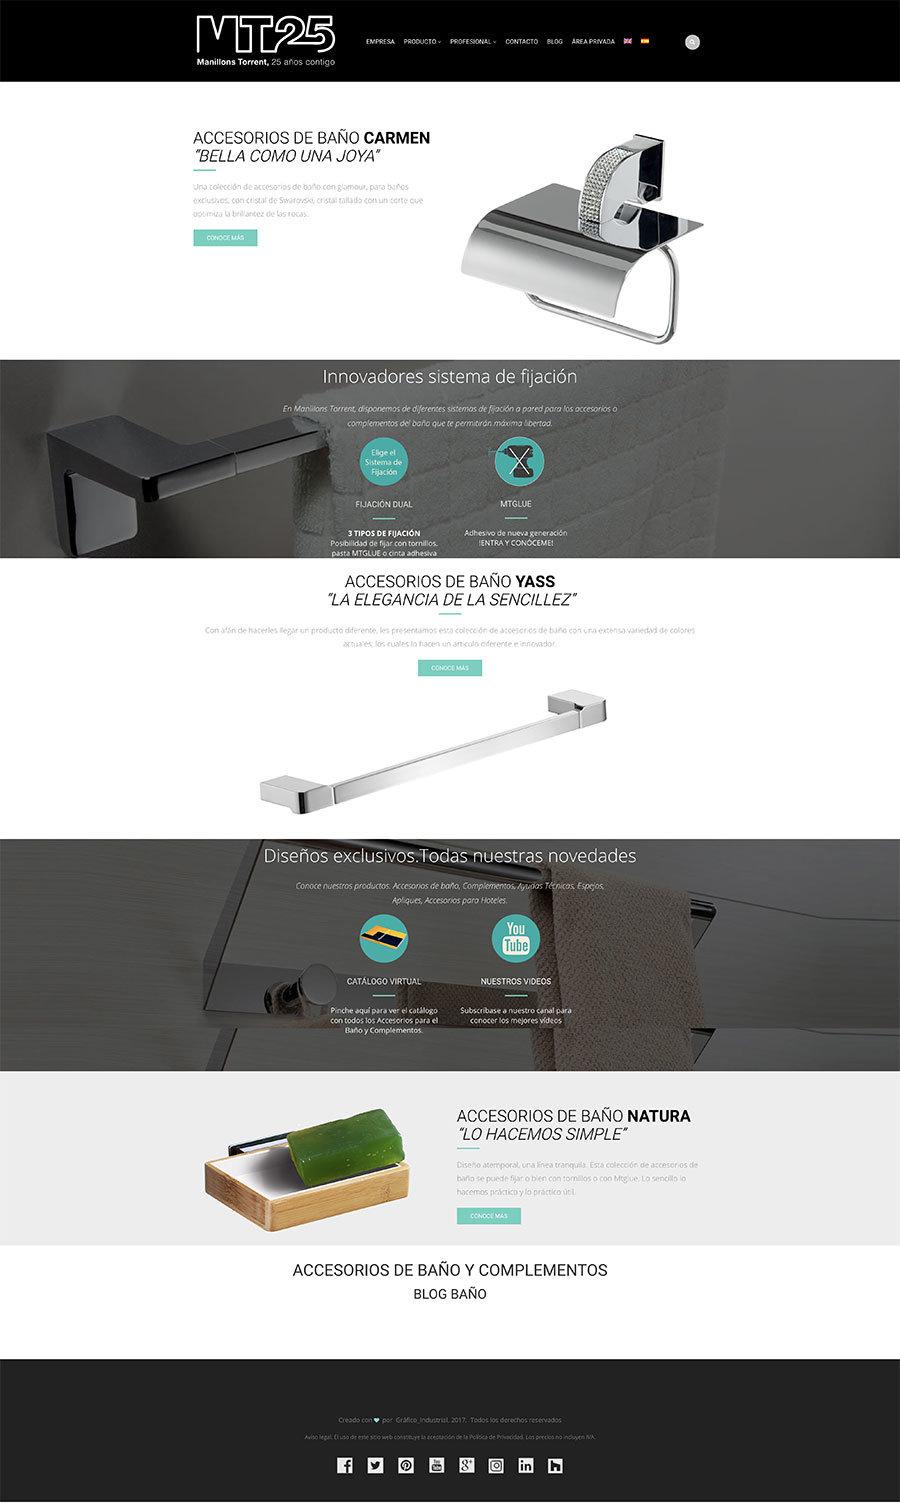 Wellaggio-diseño-web-valencia-manillons-2018-08-17-09_59_05